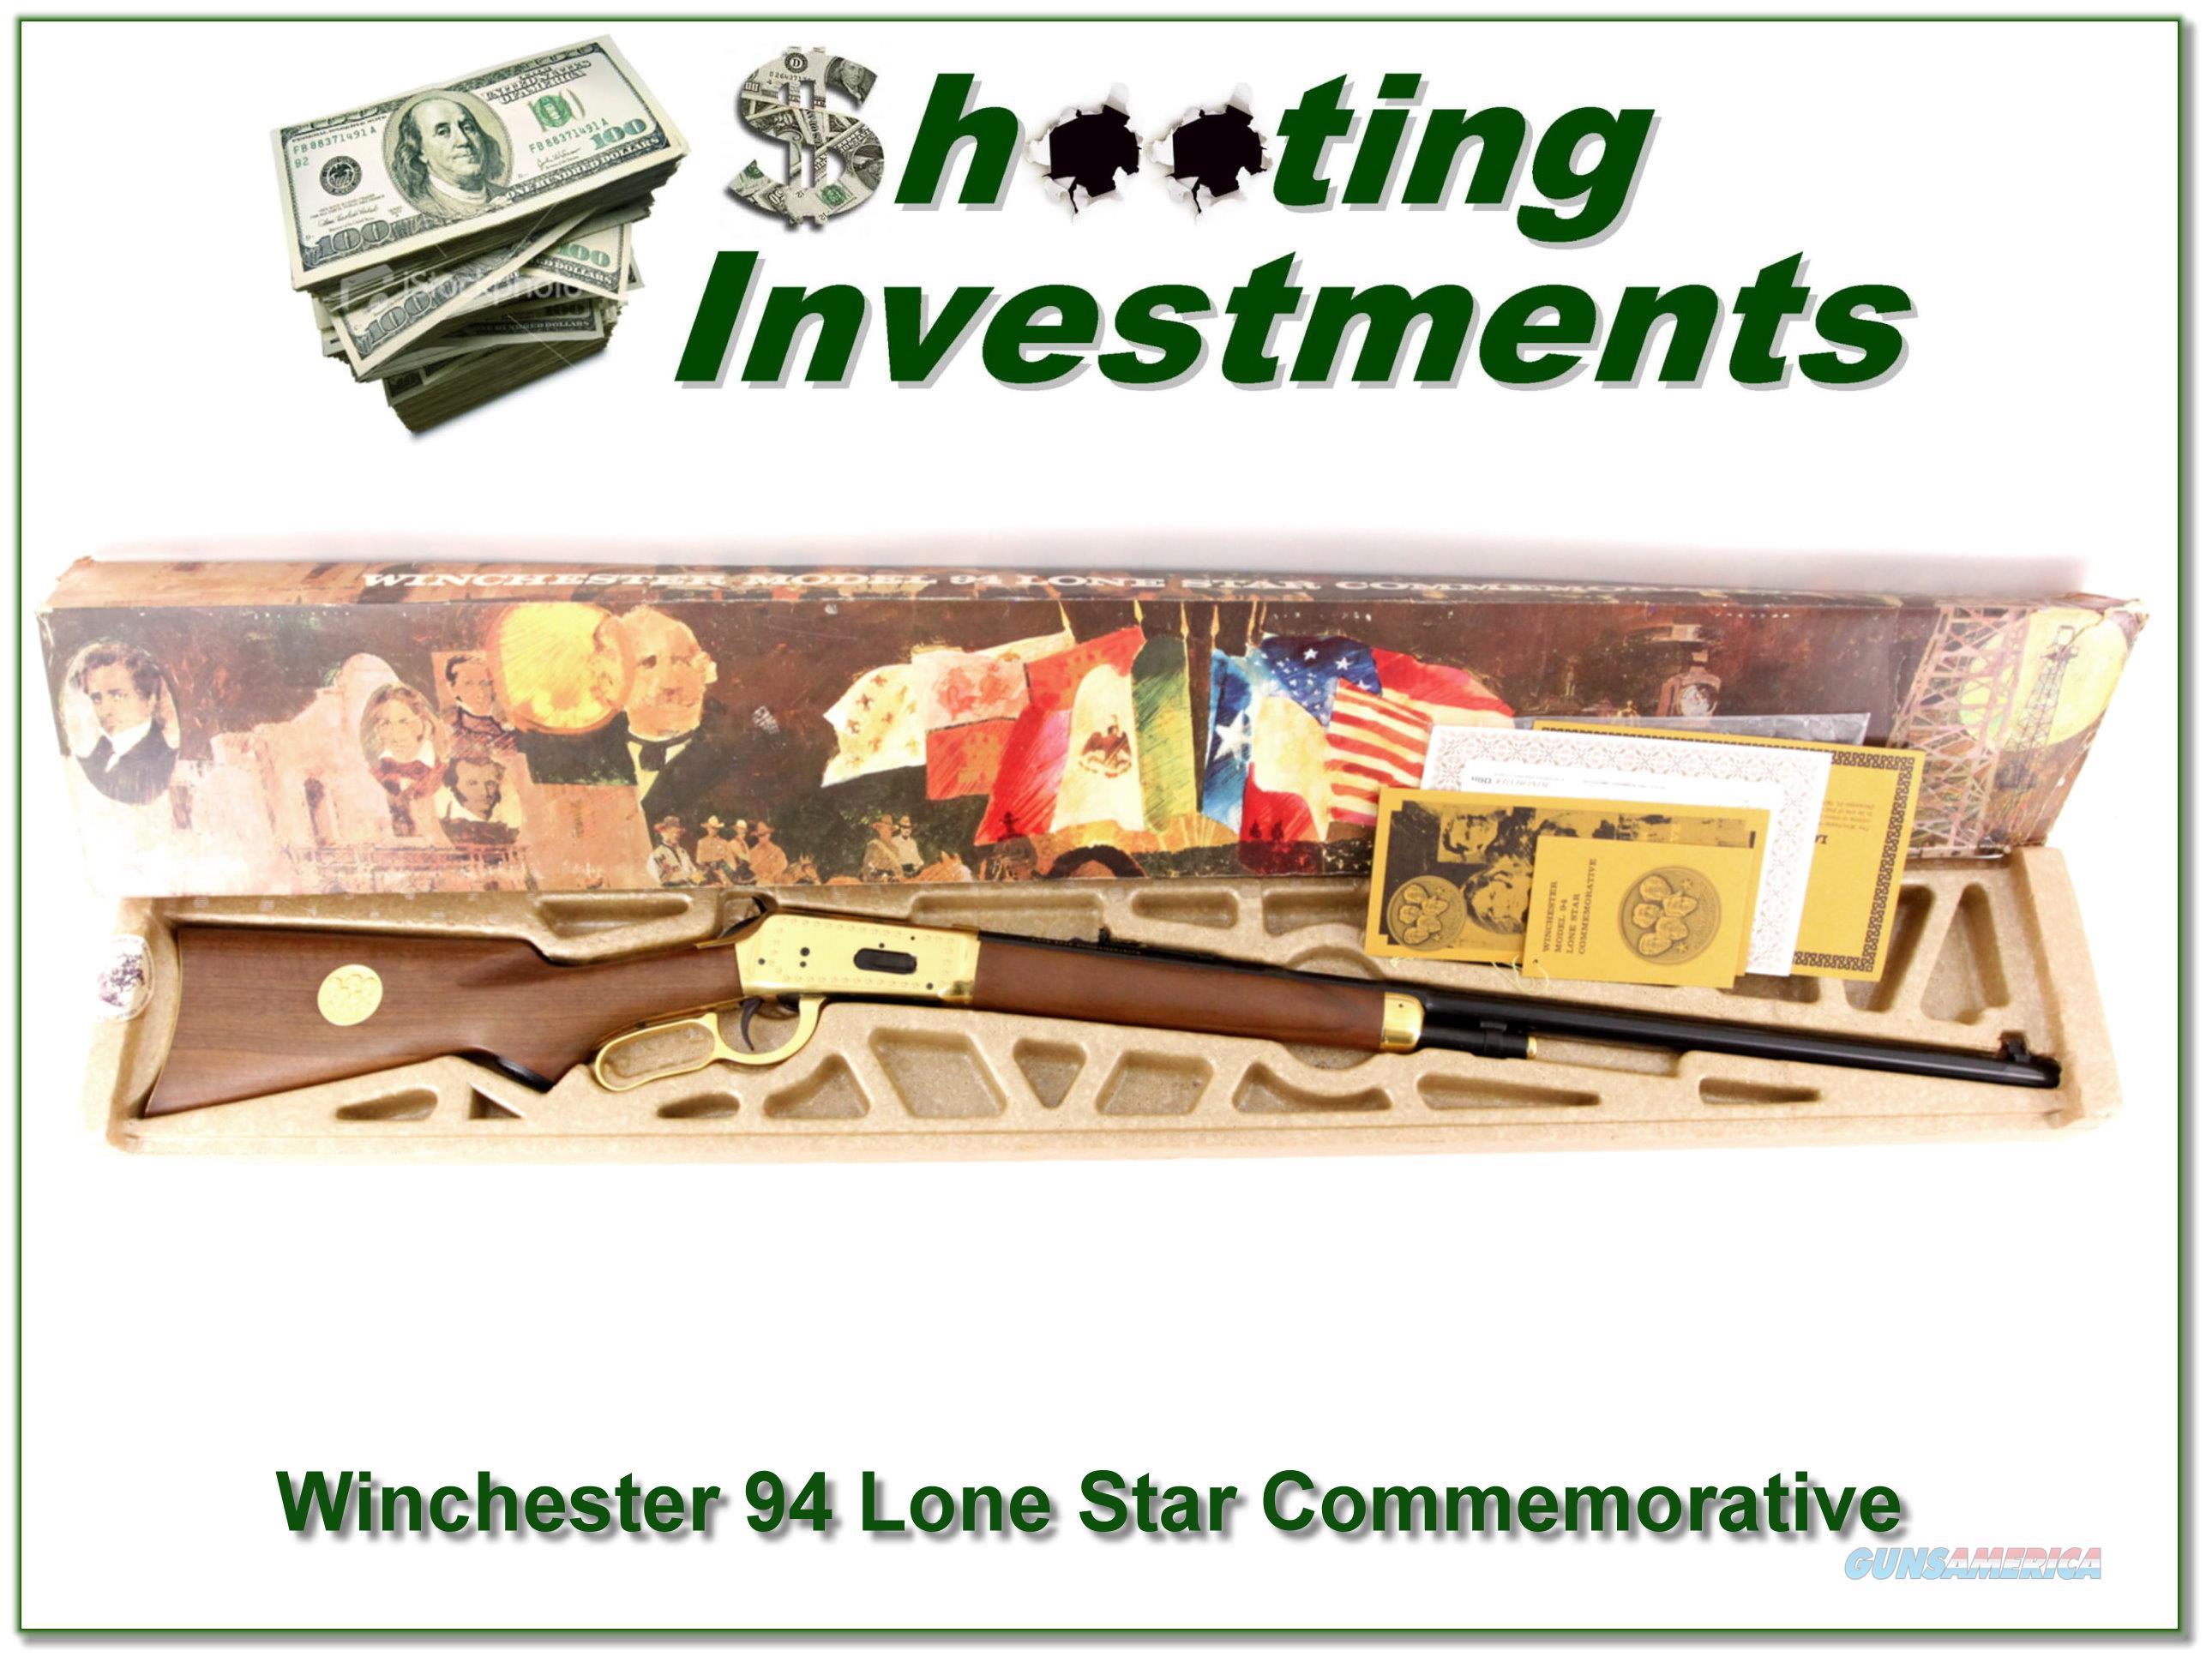 Winchester Lone Star 30-30 26in rifle NIB  Guns > Rifles > Winchester Rifles - Modern Lever > Model 94 > Post-64